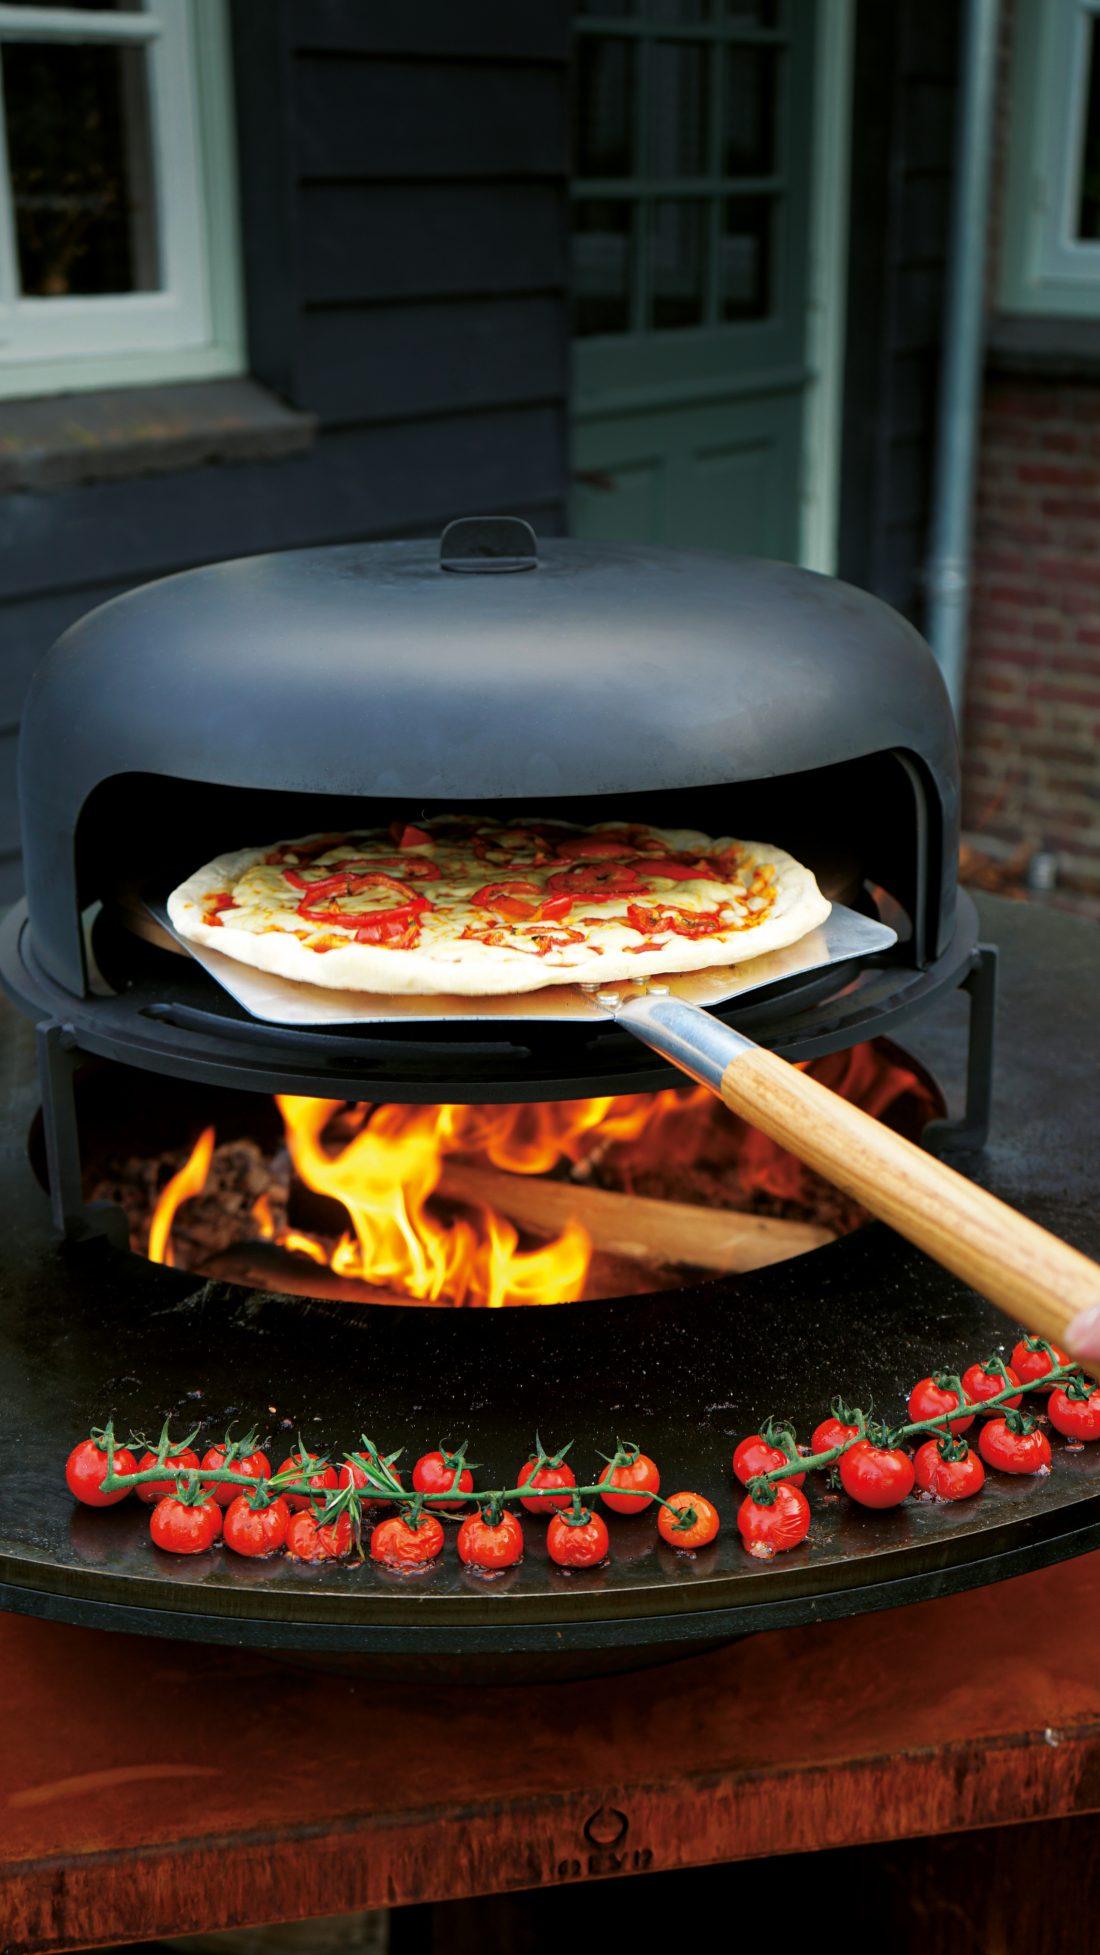 Bak de lekkerste pizza's in je eigen tuin